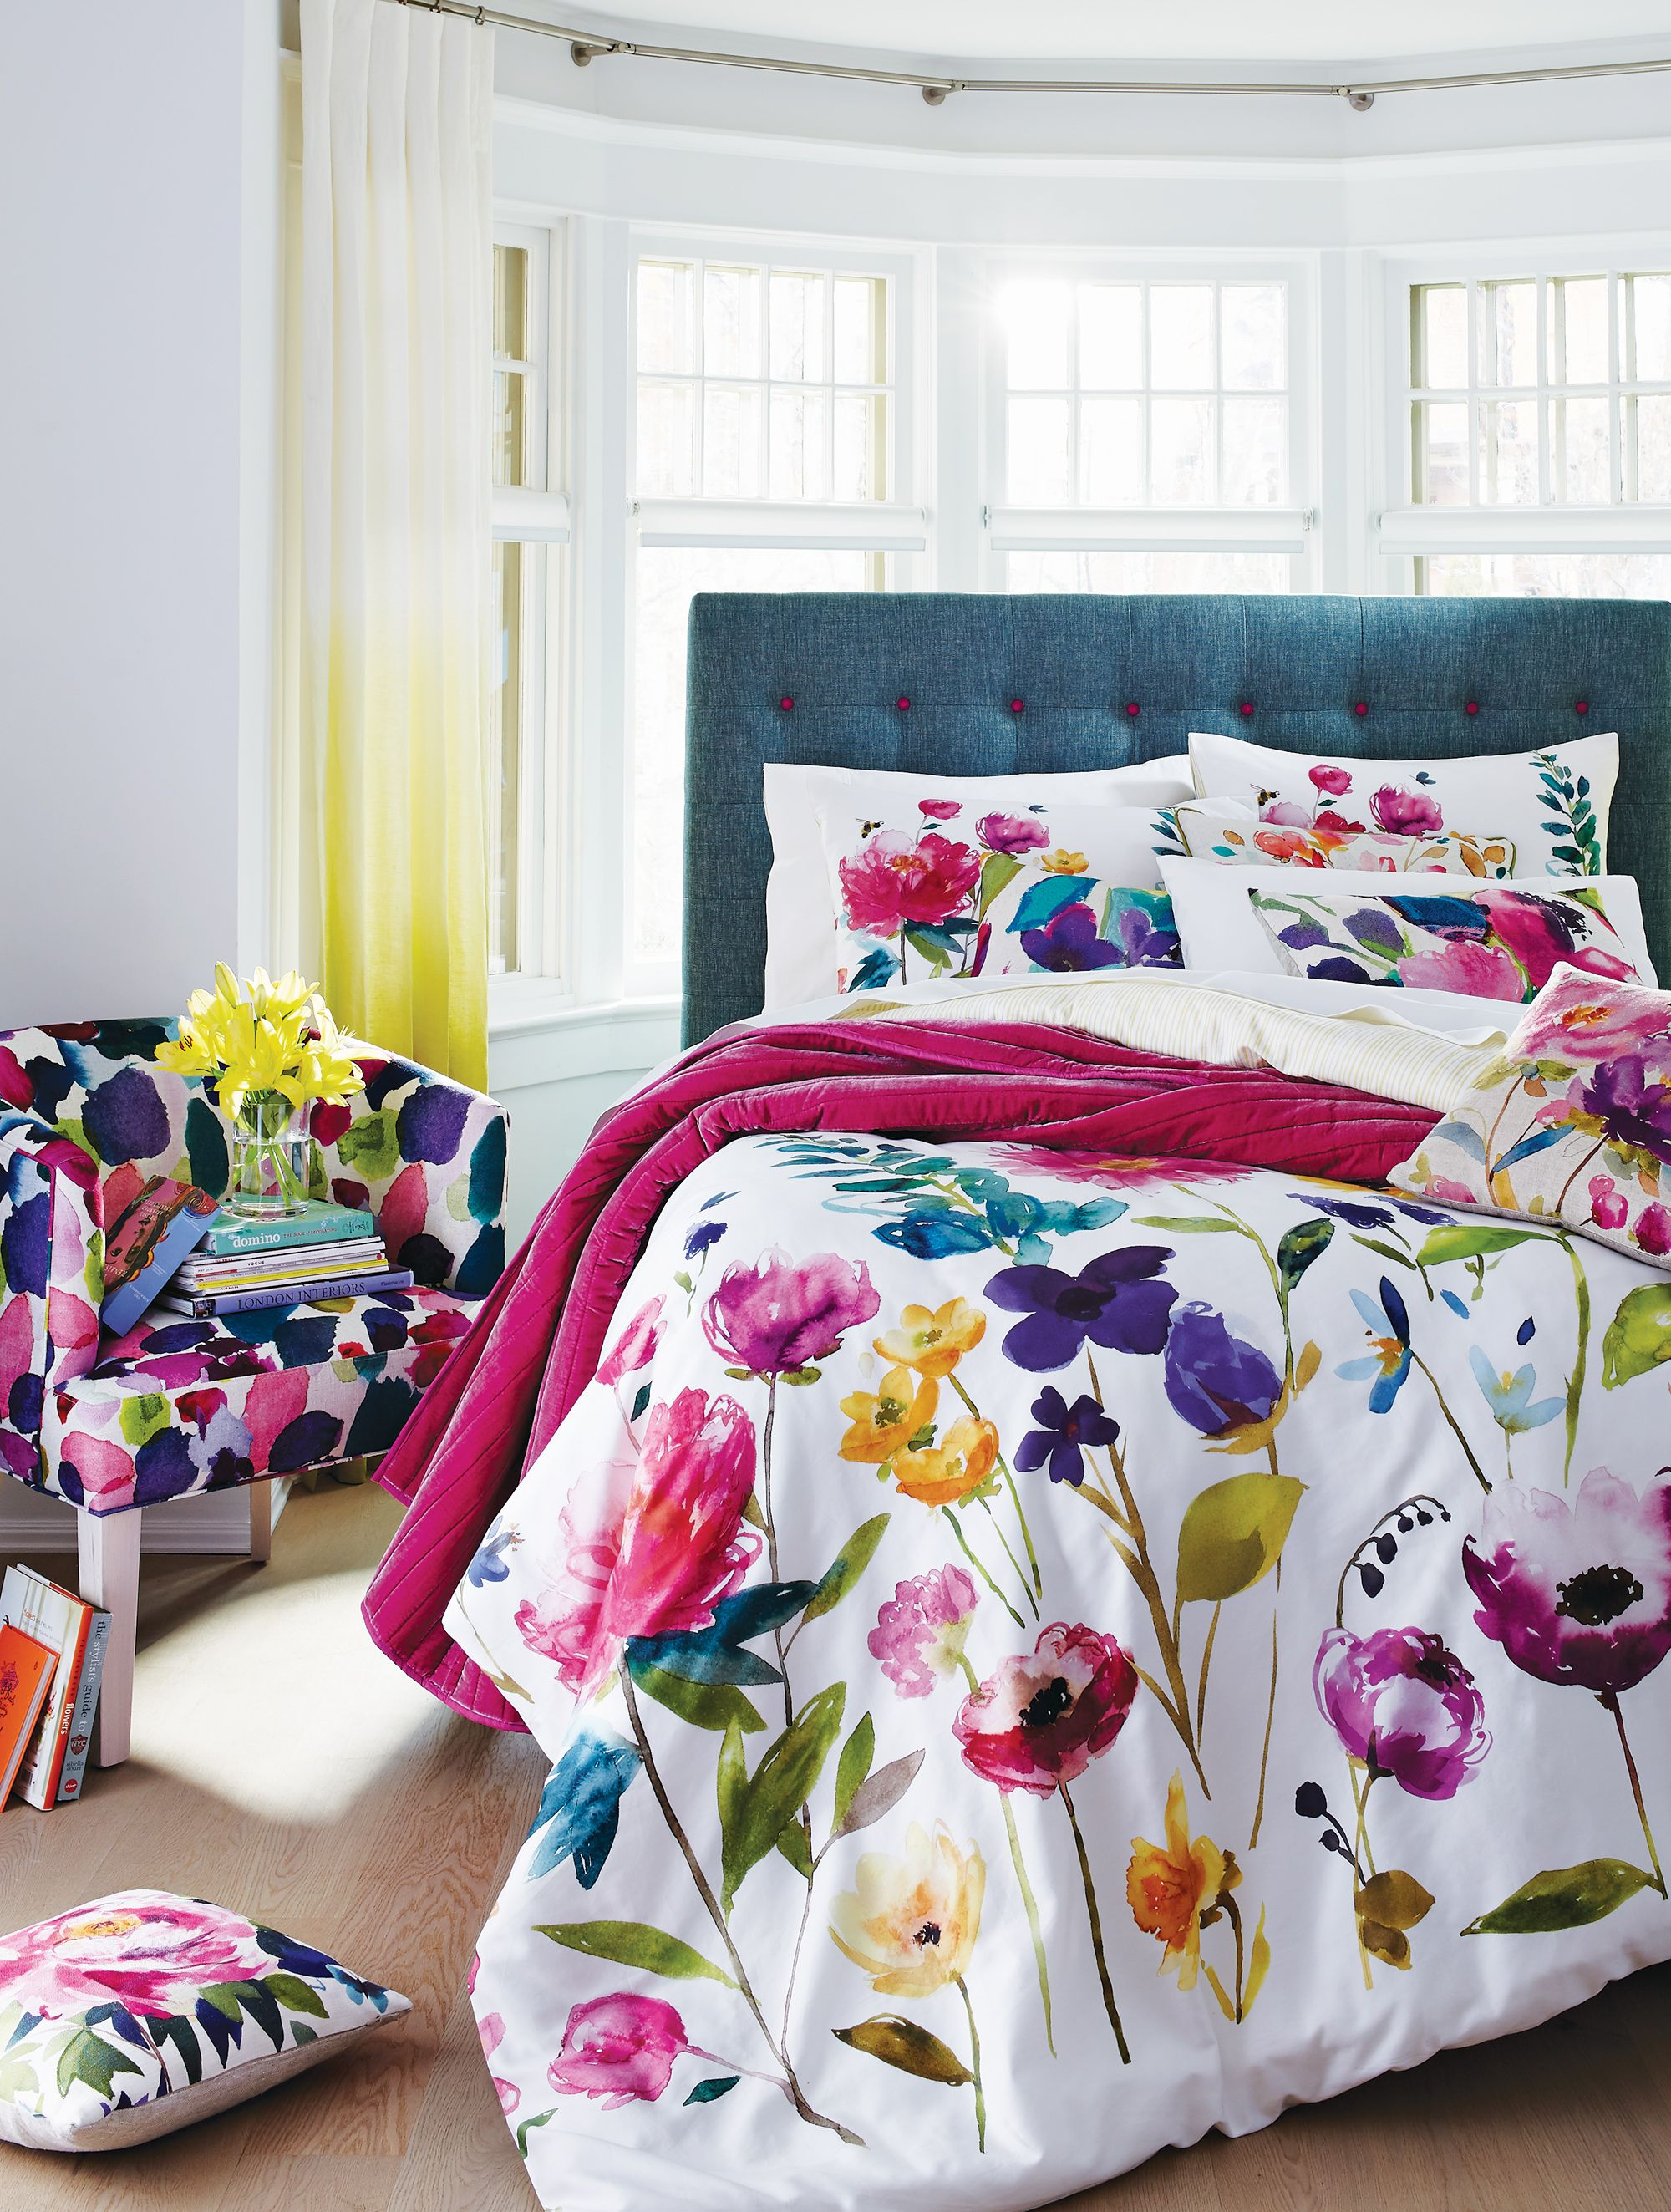 Adding Colour Into Your Life Lifts Spirits It Makes You Feel Good Fiona Douglas Bluebellgray